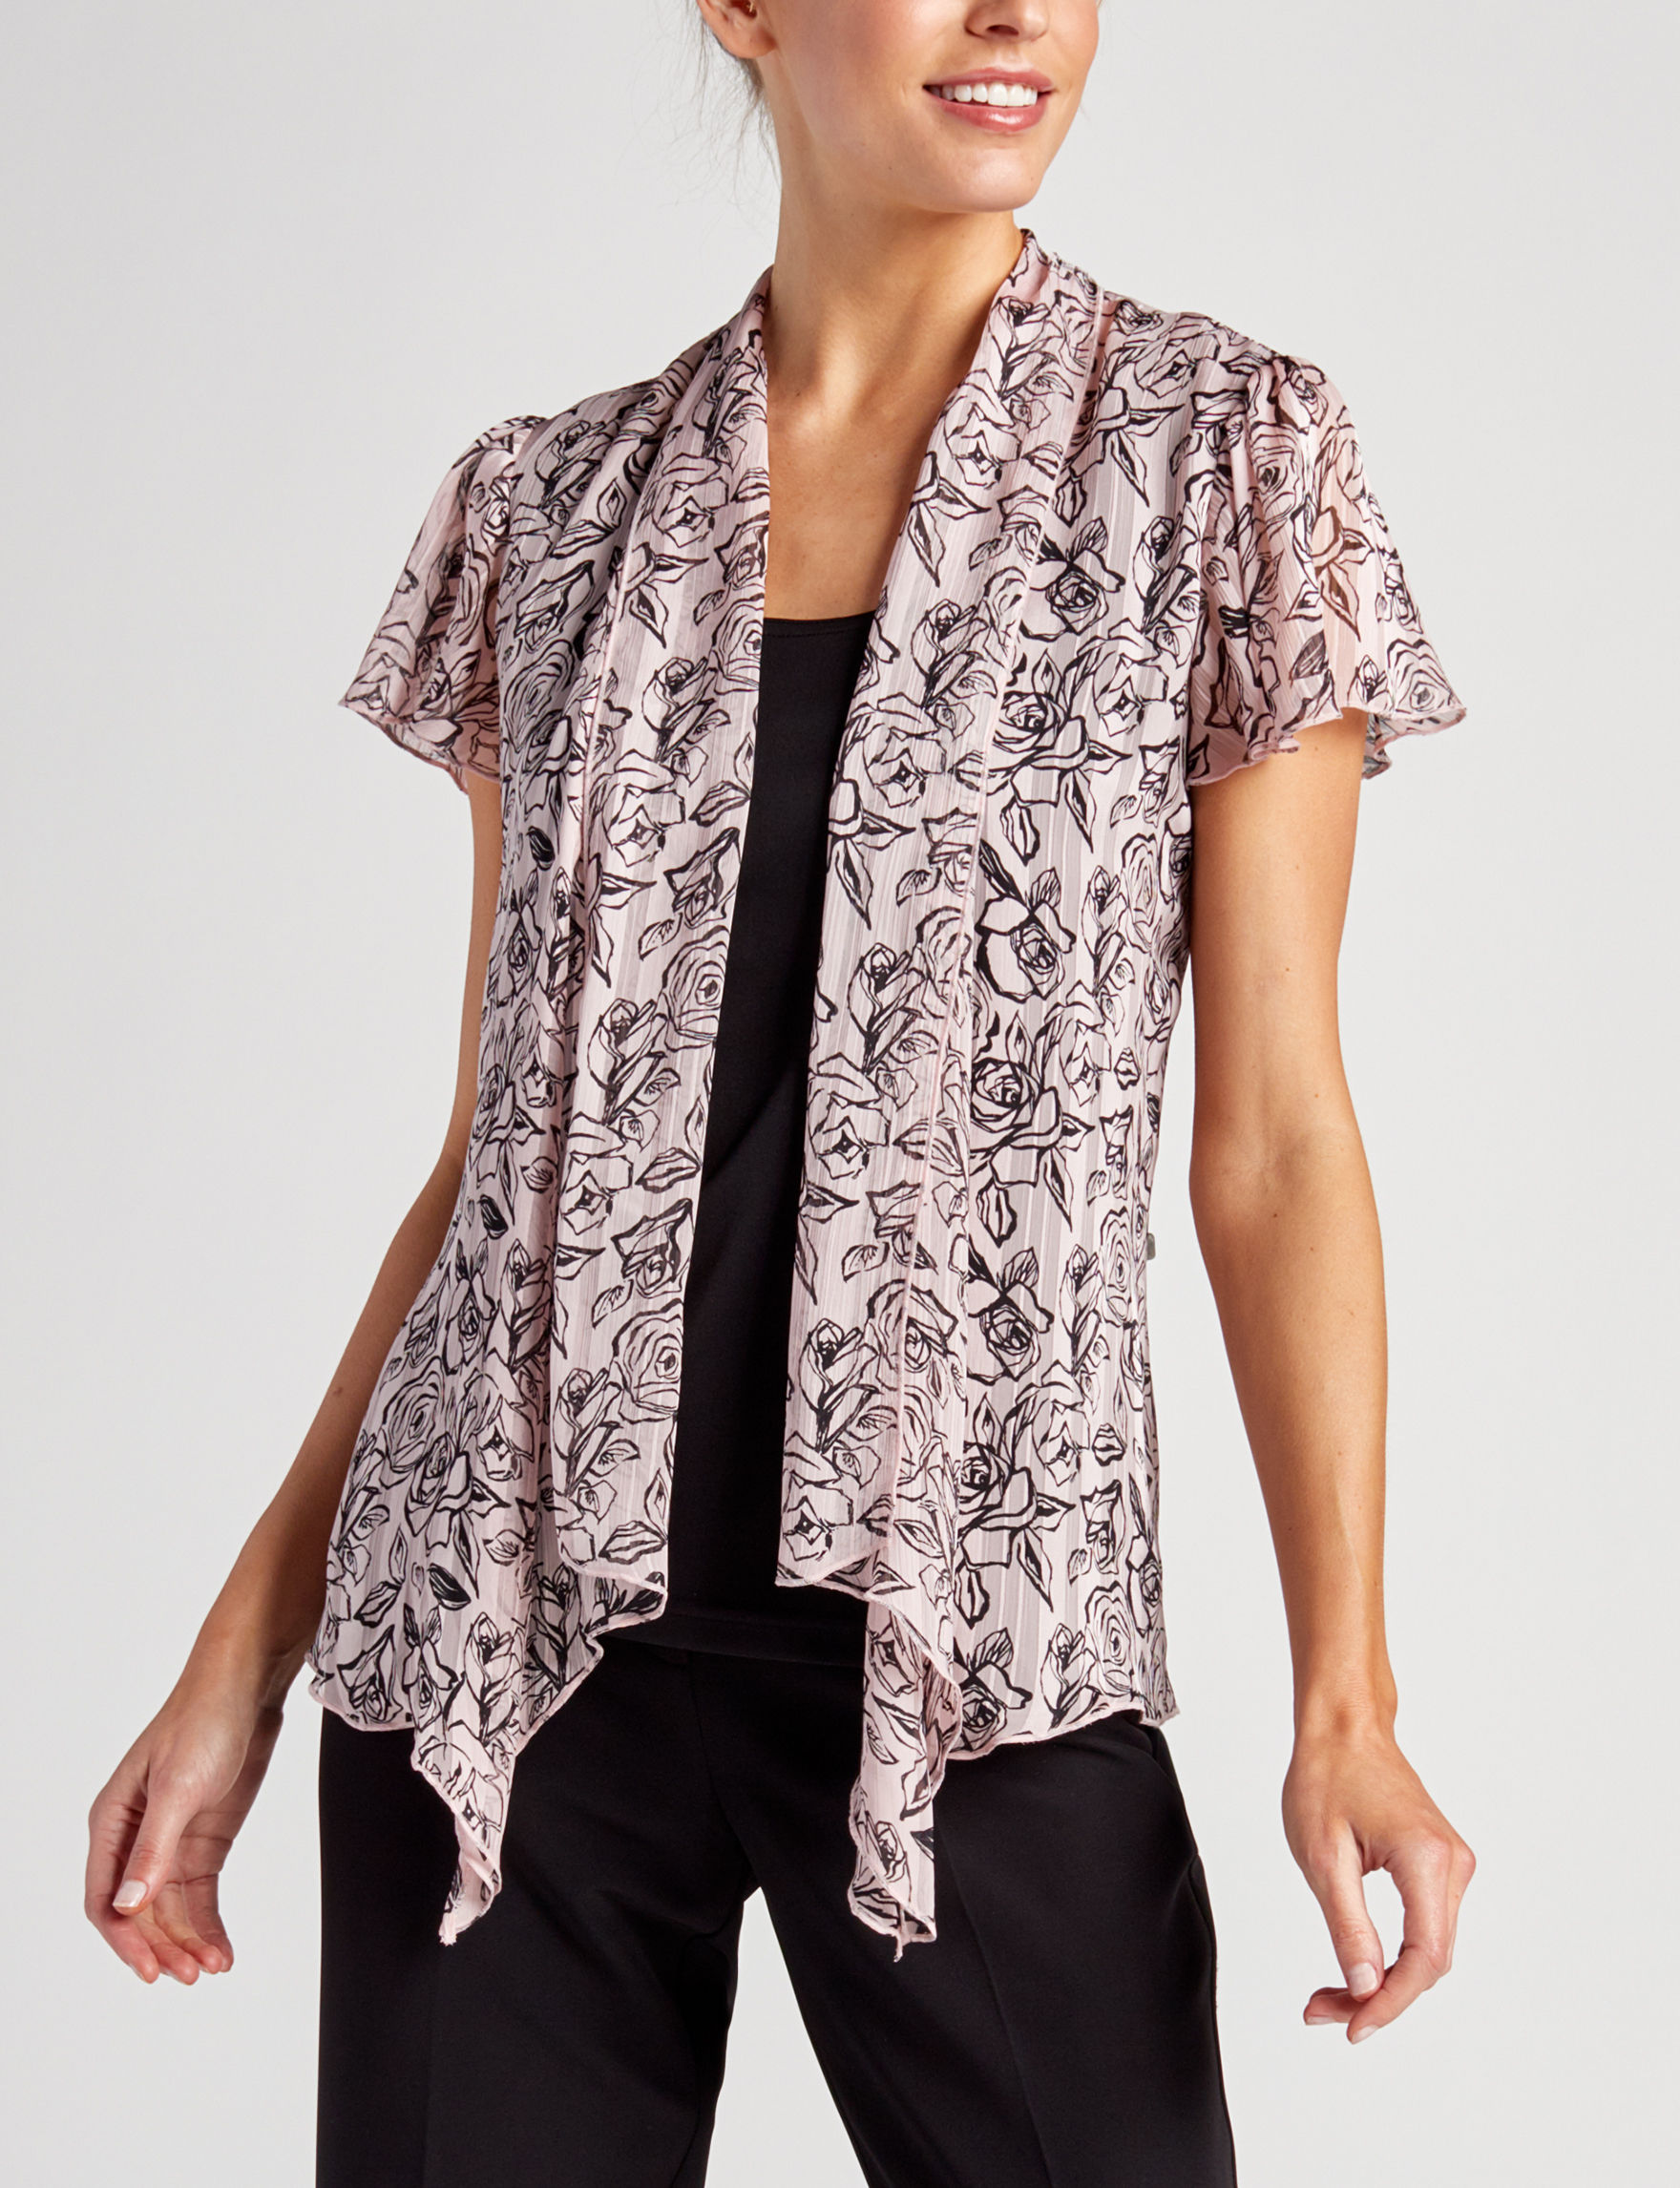 Sara Michelle Mauve / Black Shirts & Blouses